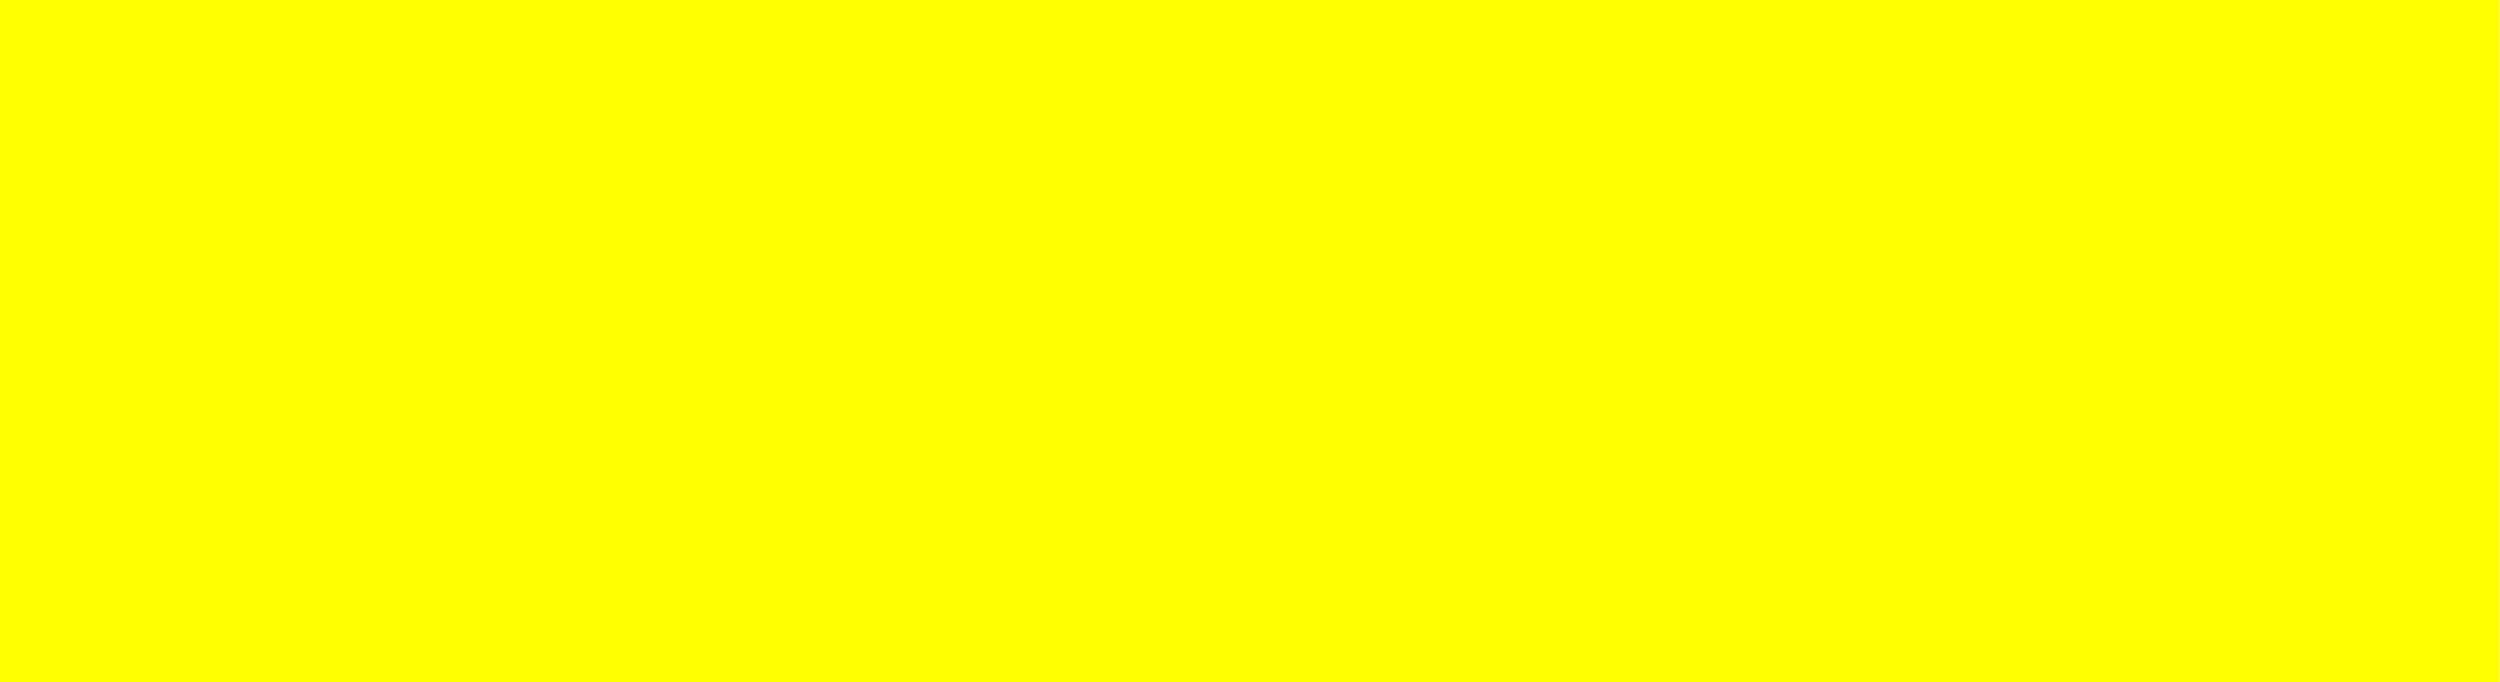 color block_1.jpg